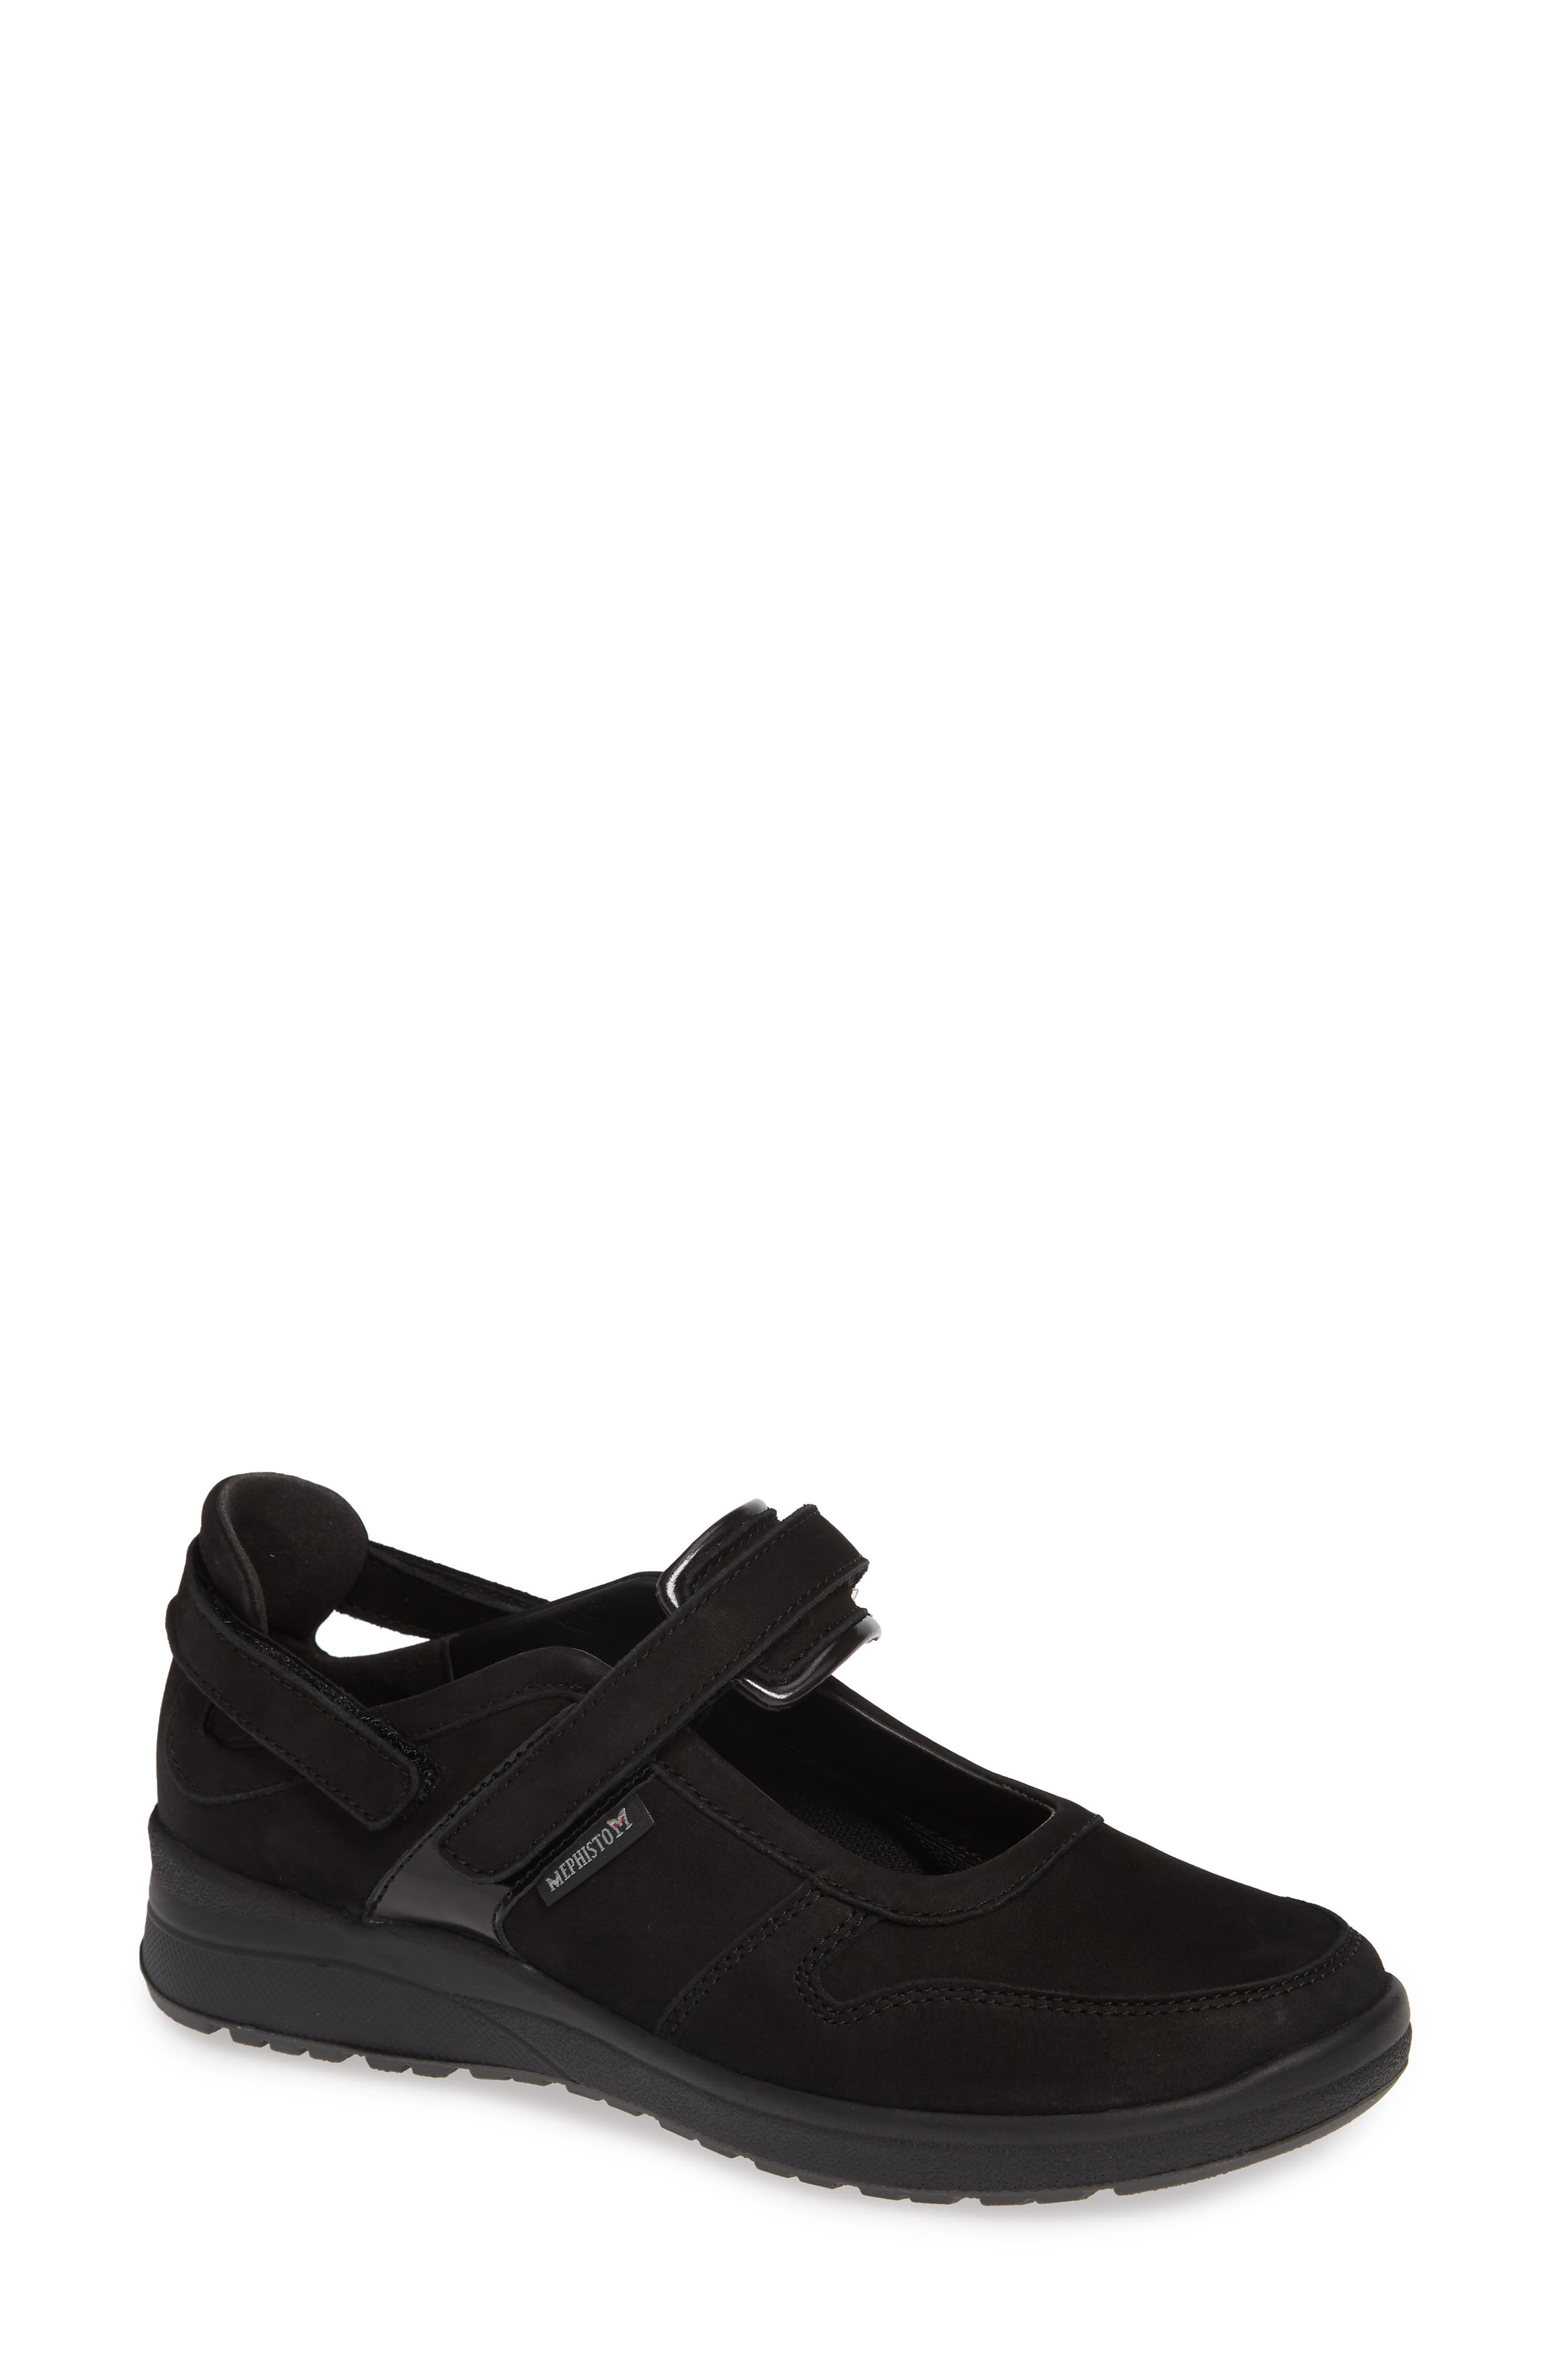 MEPHISTO Rejine Sneaker, Main, color, BLACK FABRIC